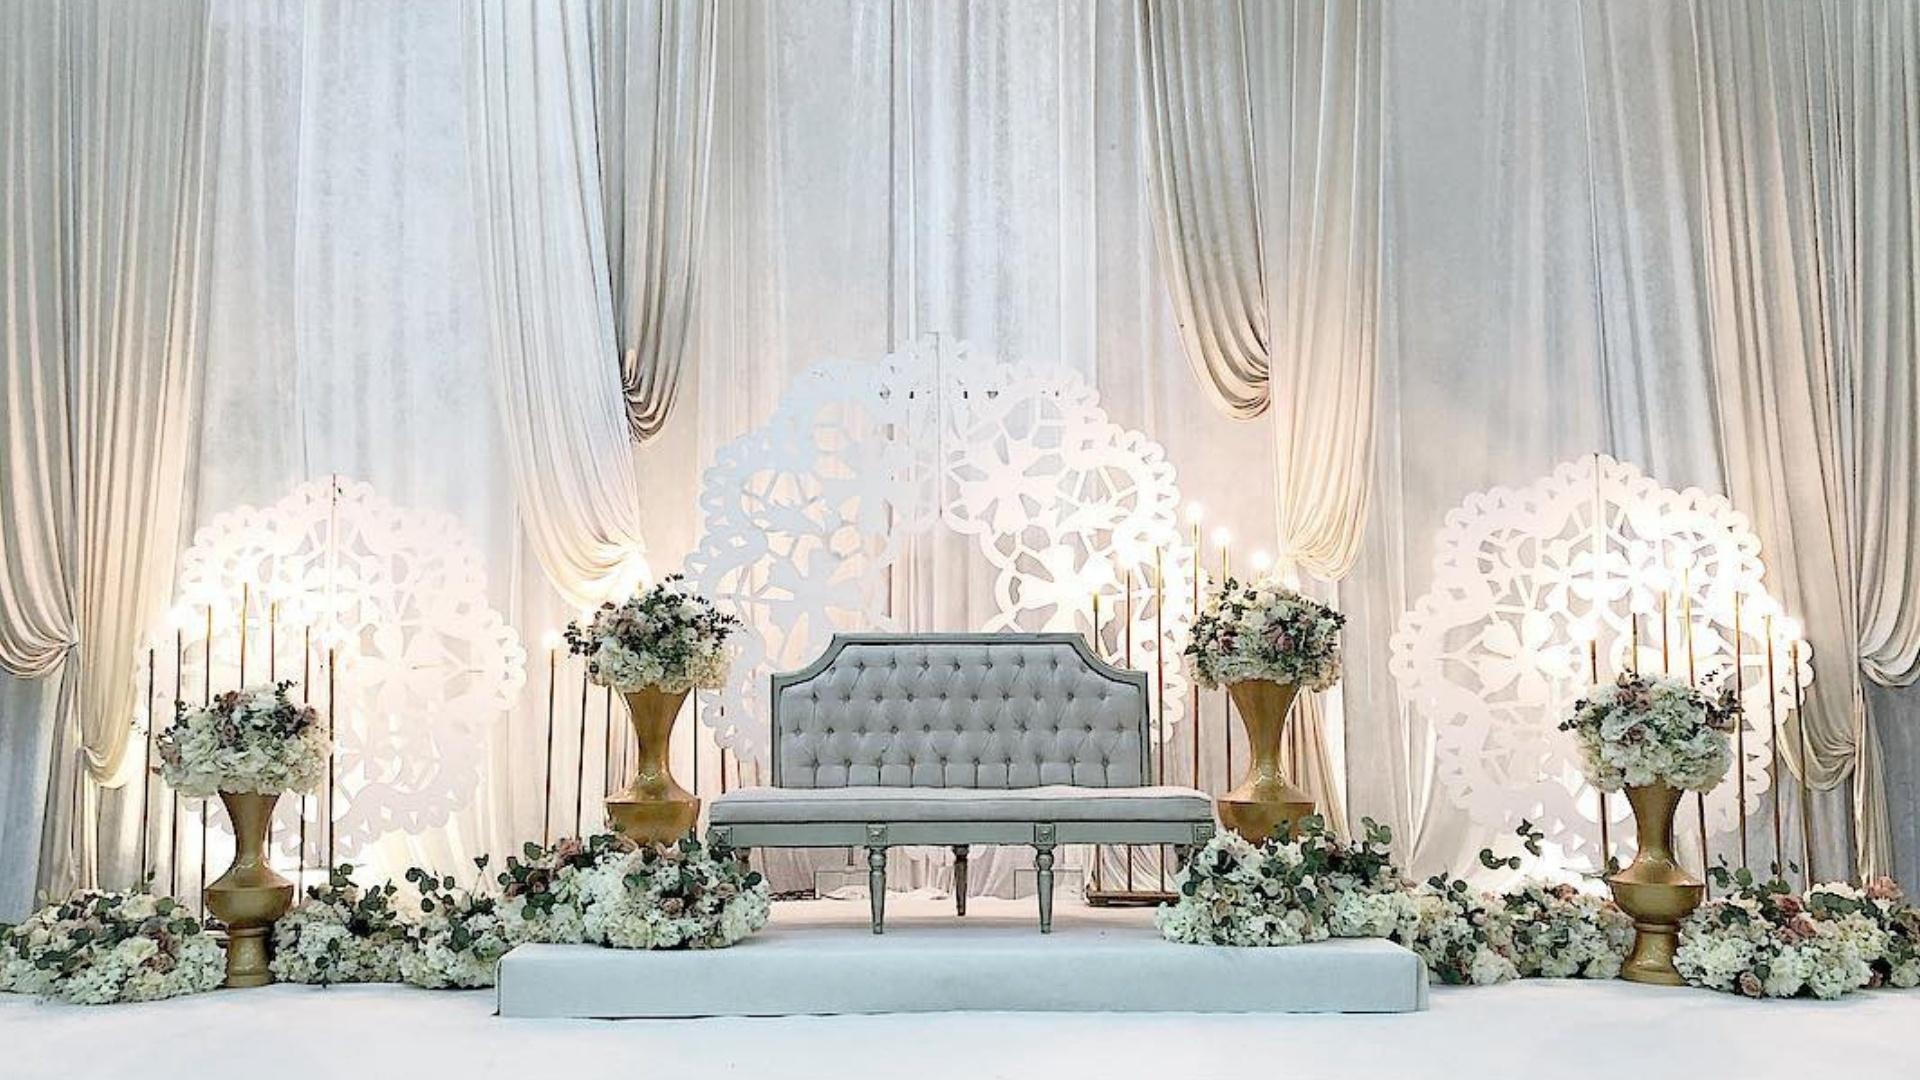 pakej perkahwinan lengkap 2020-2021-2022-najiha-online